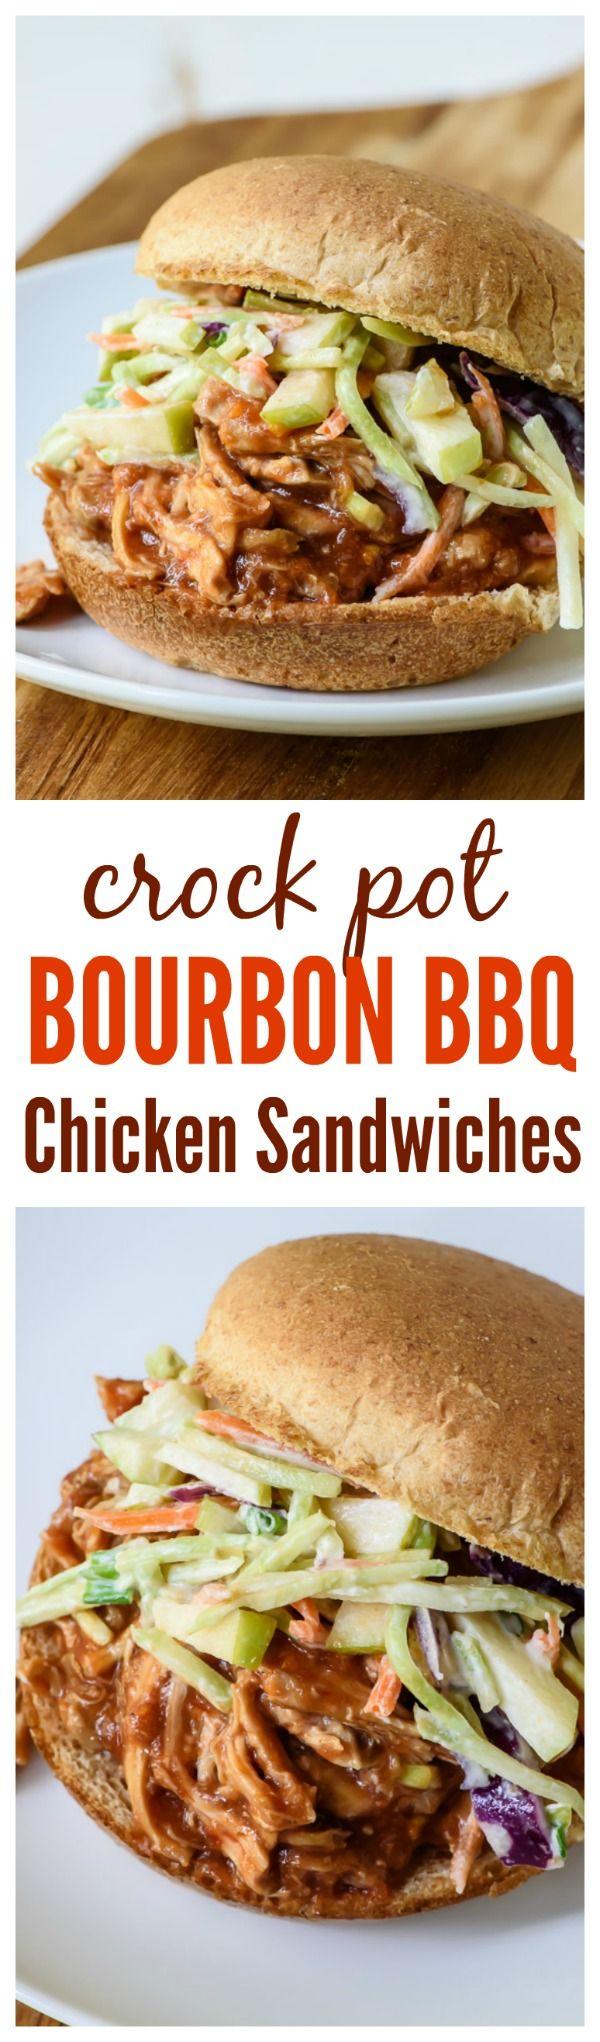 Crock Pot Bourbon BBQ Chicken Sandwiches with Apple Slaw